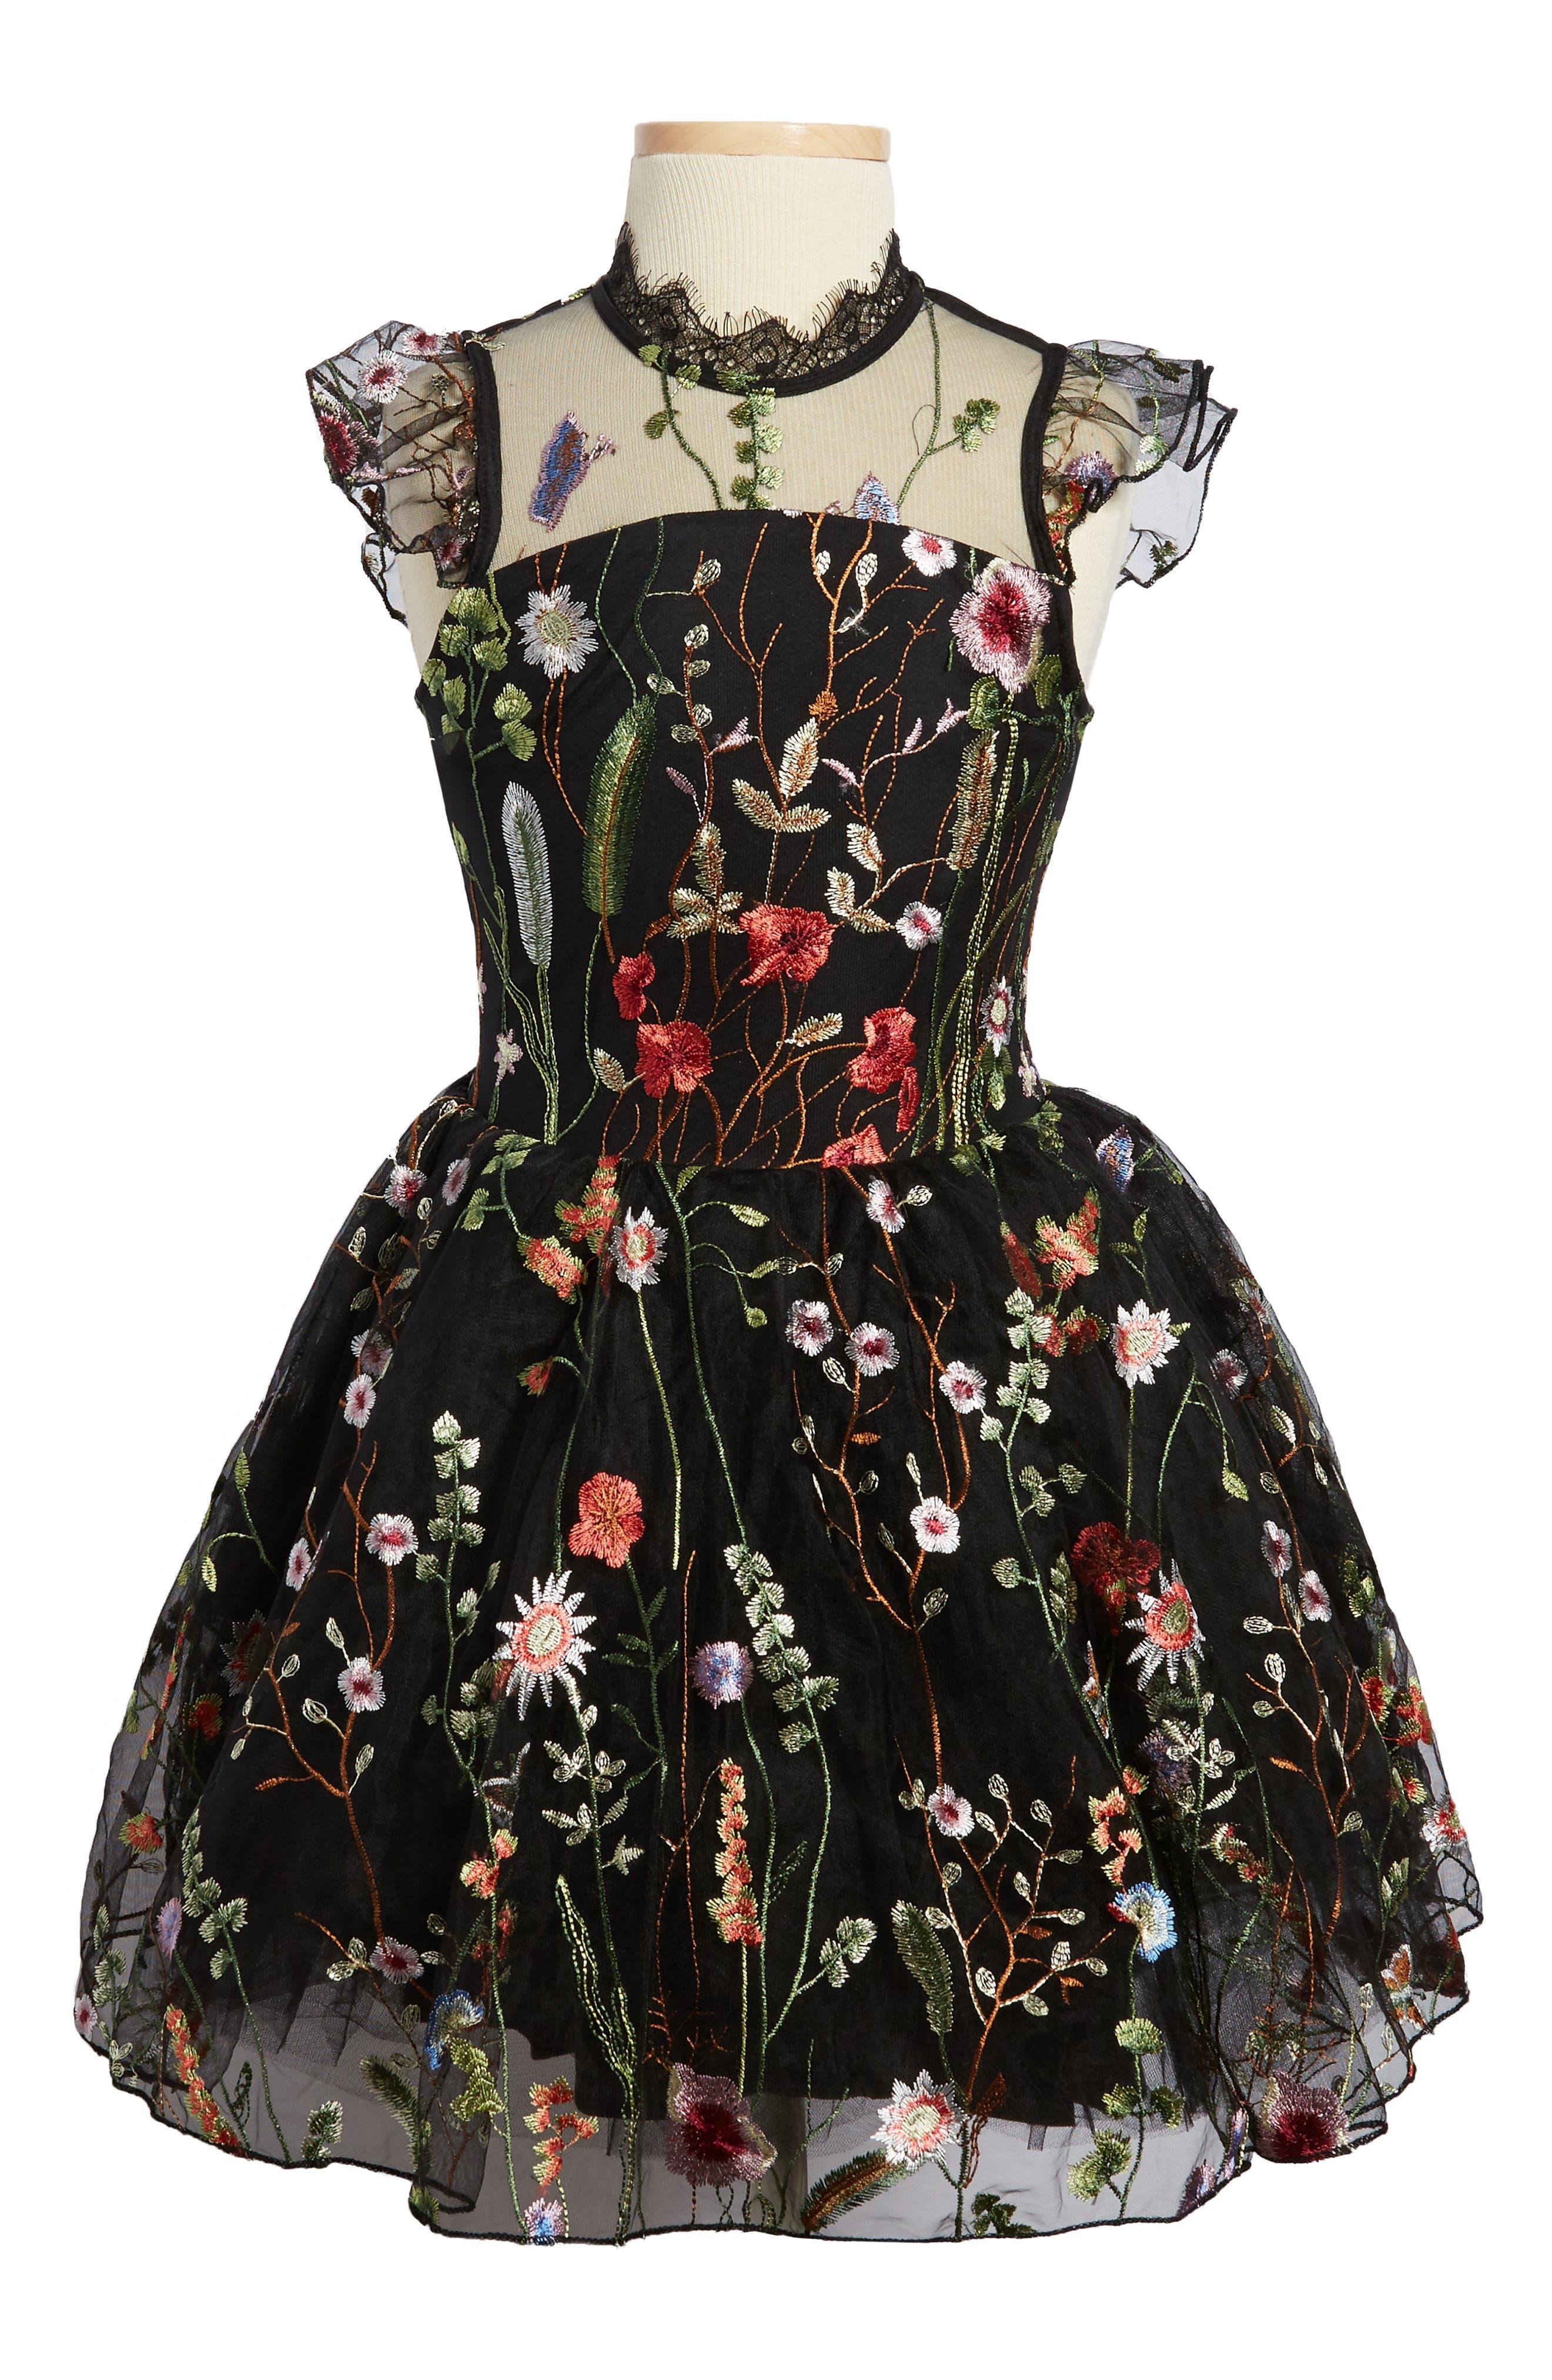 Alternate Image 1 Selected - Miss Behave Charisse Embroidered Floral Dress (Big Girls)